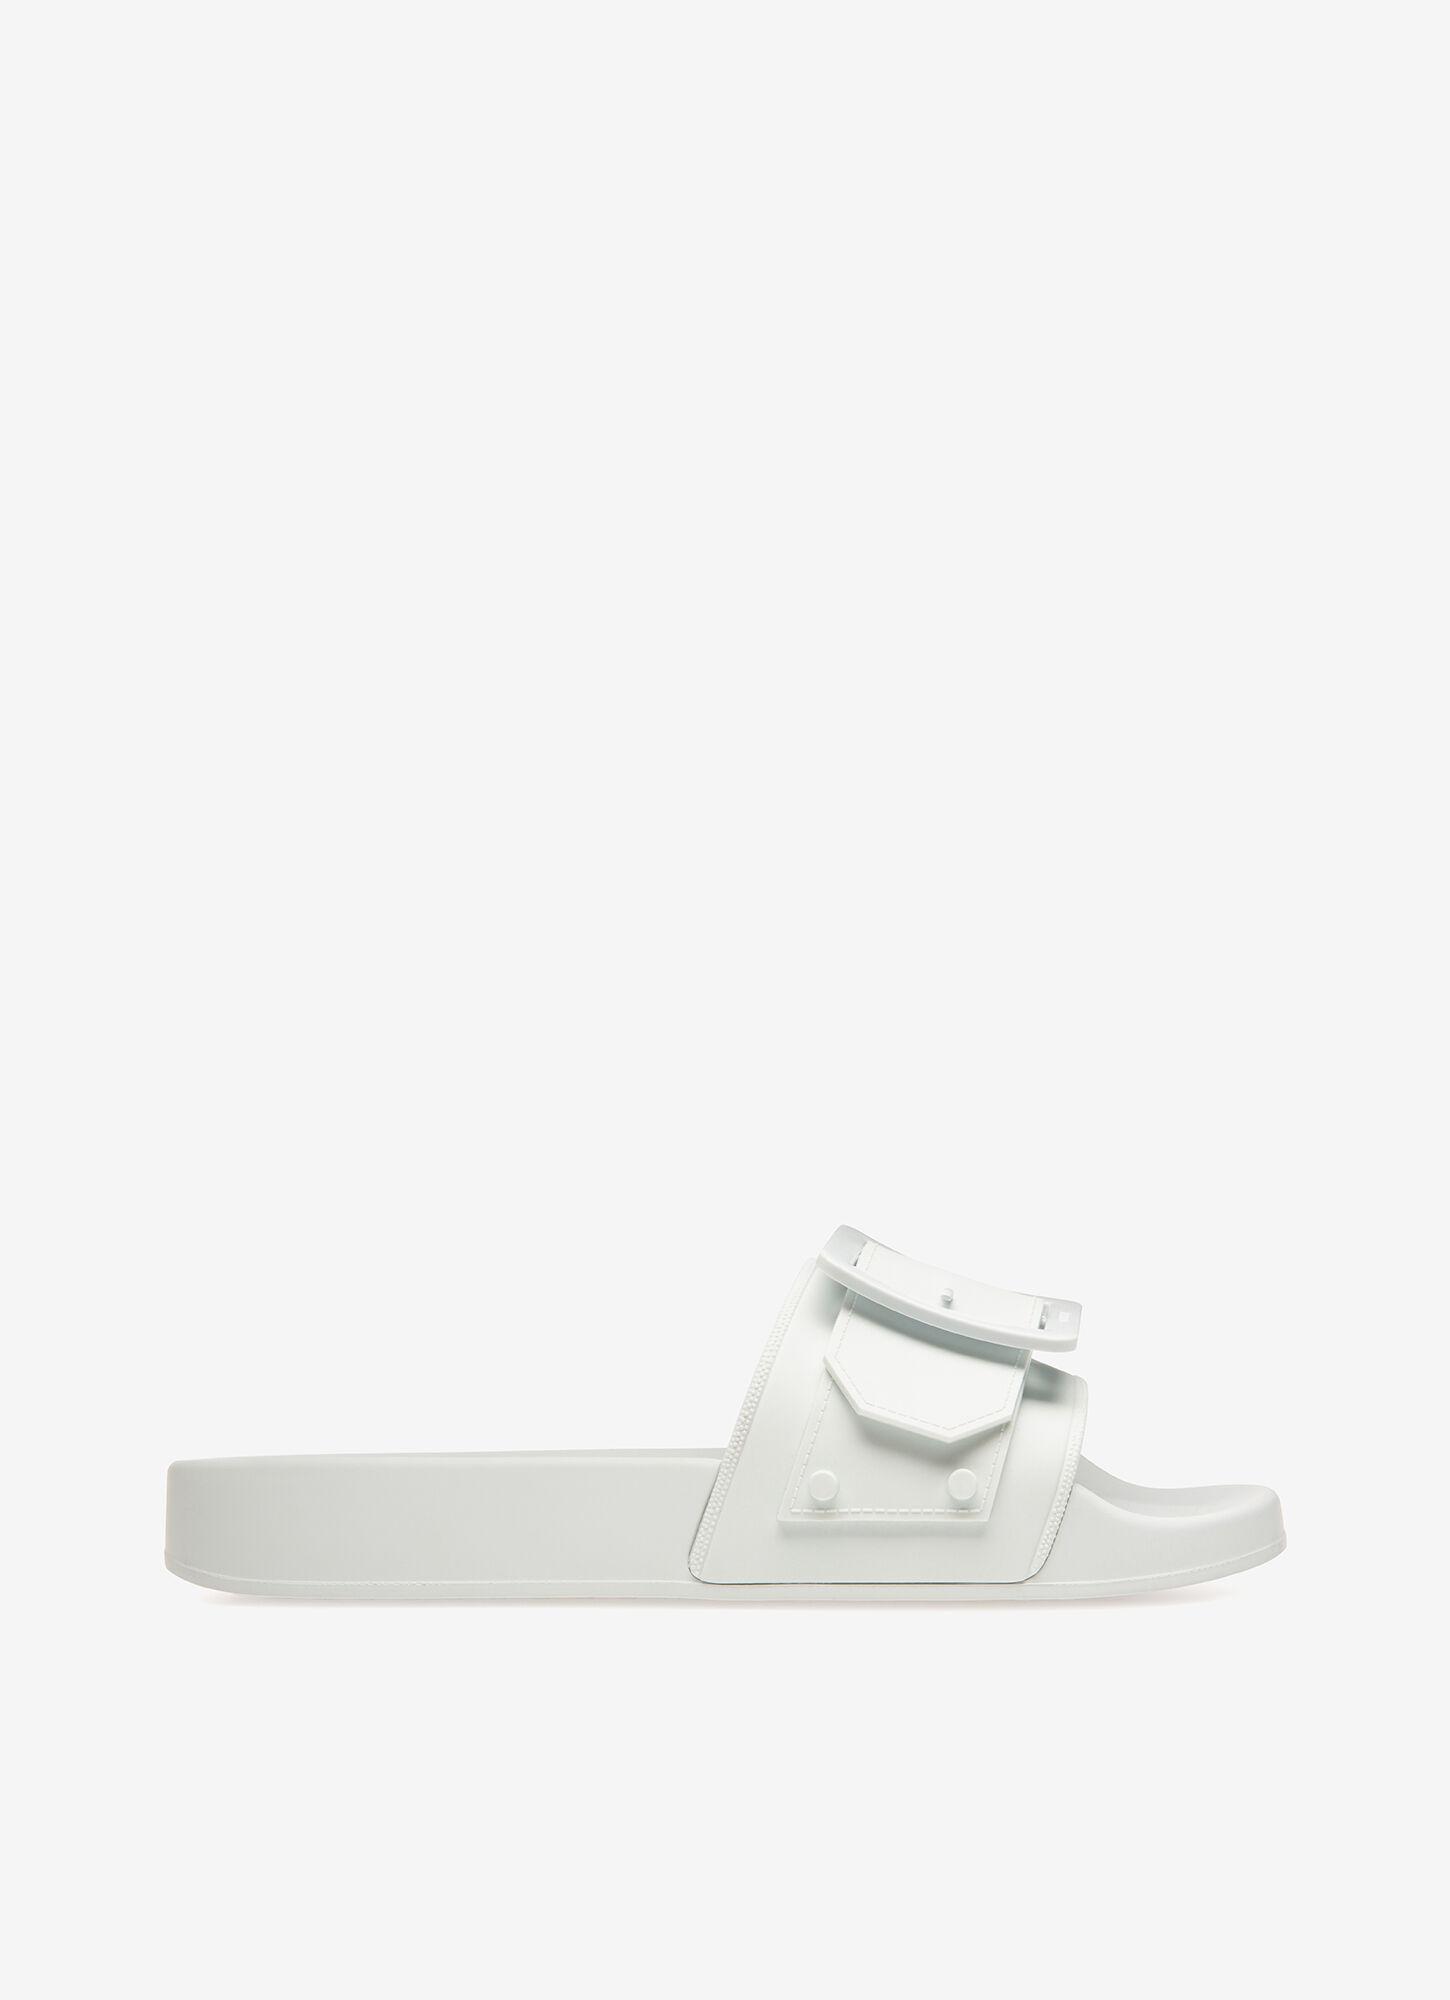 Women's Designer Sandals   Bally